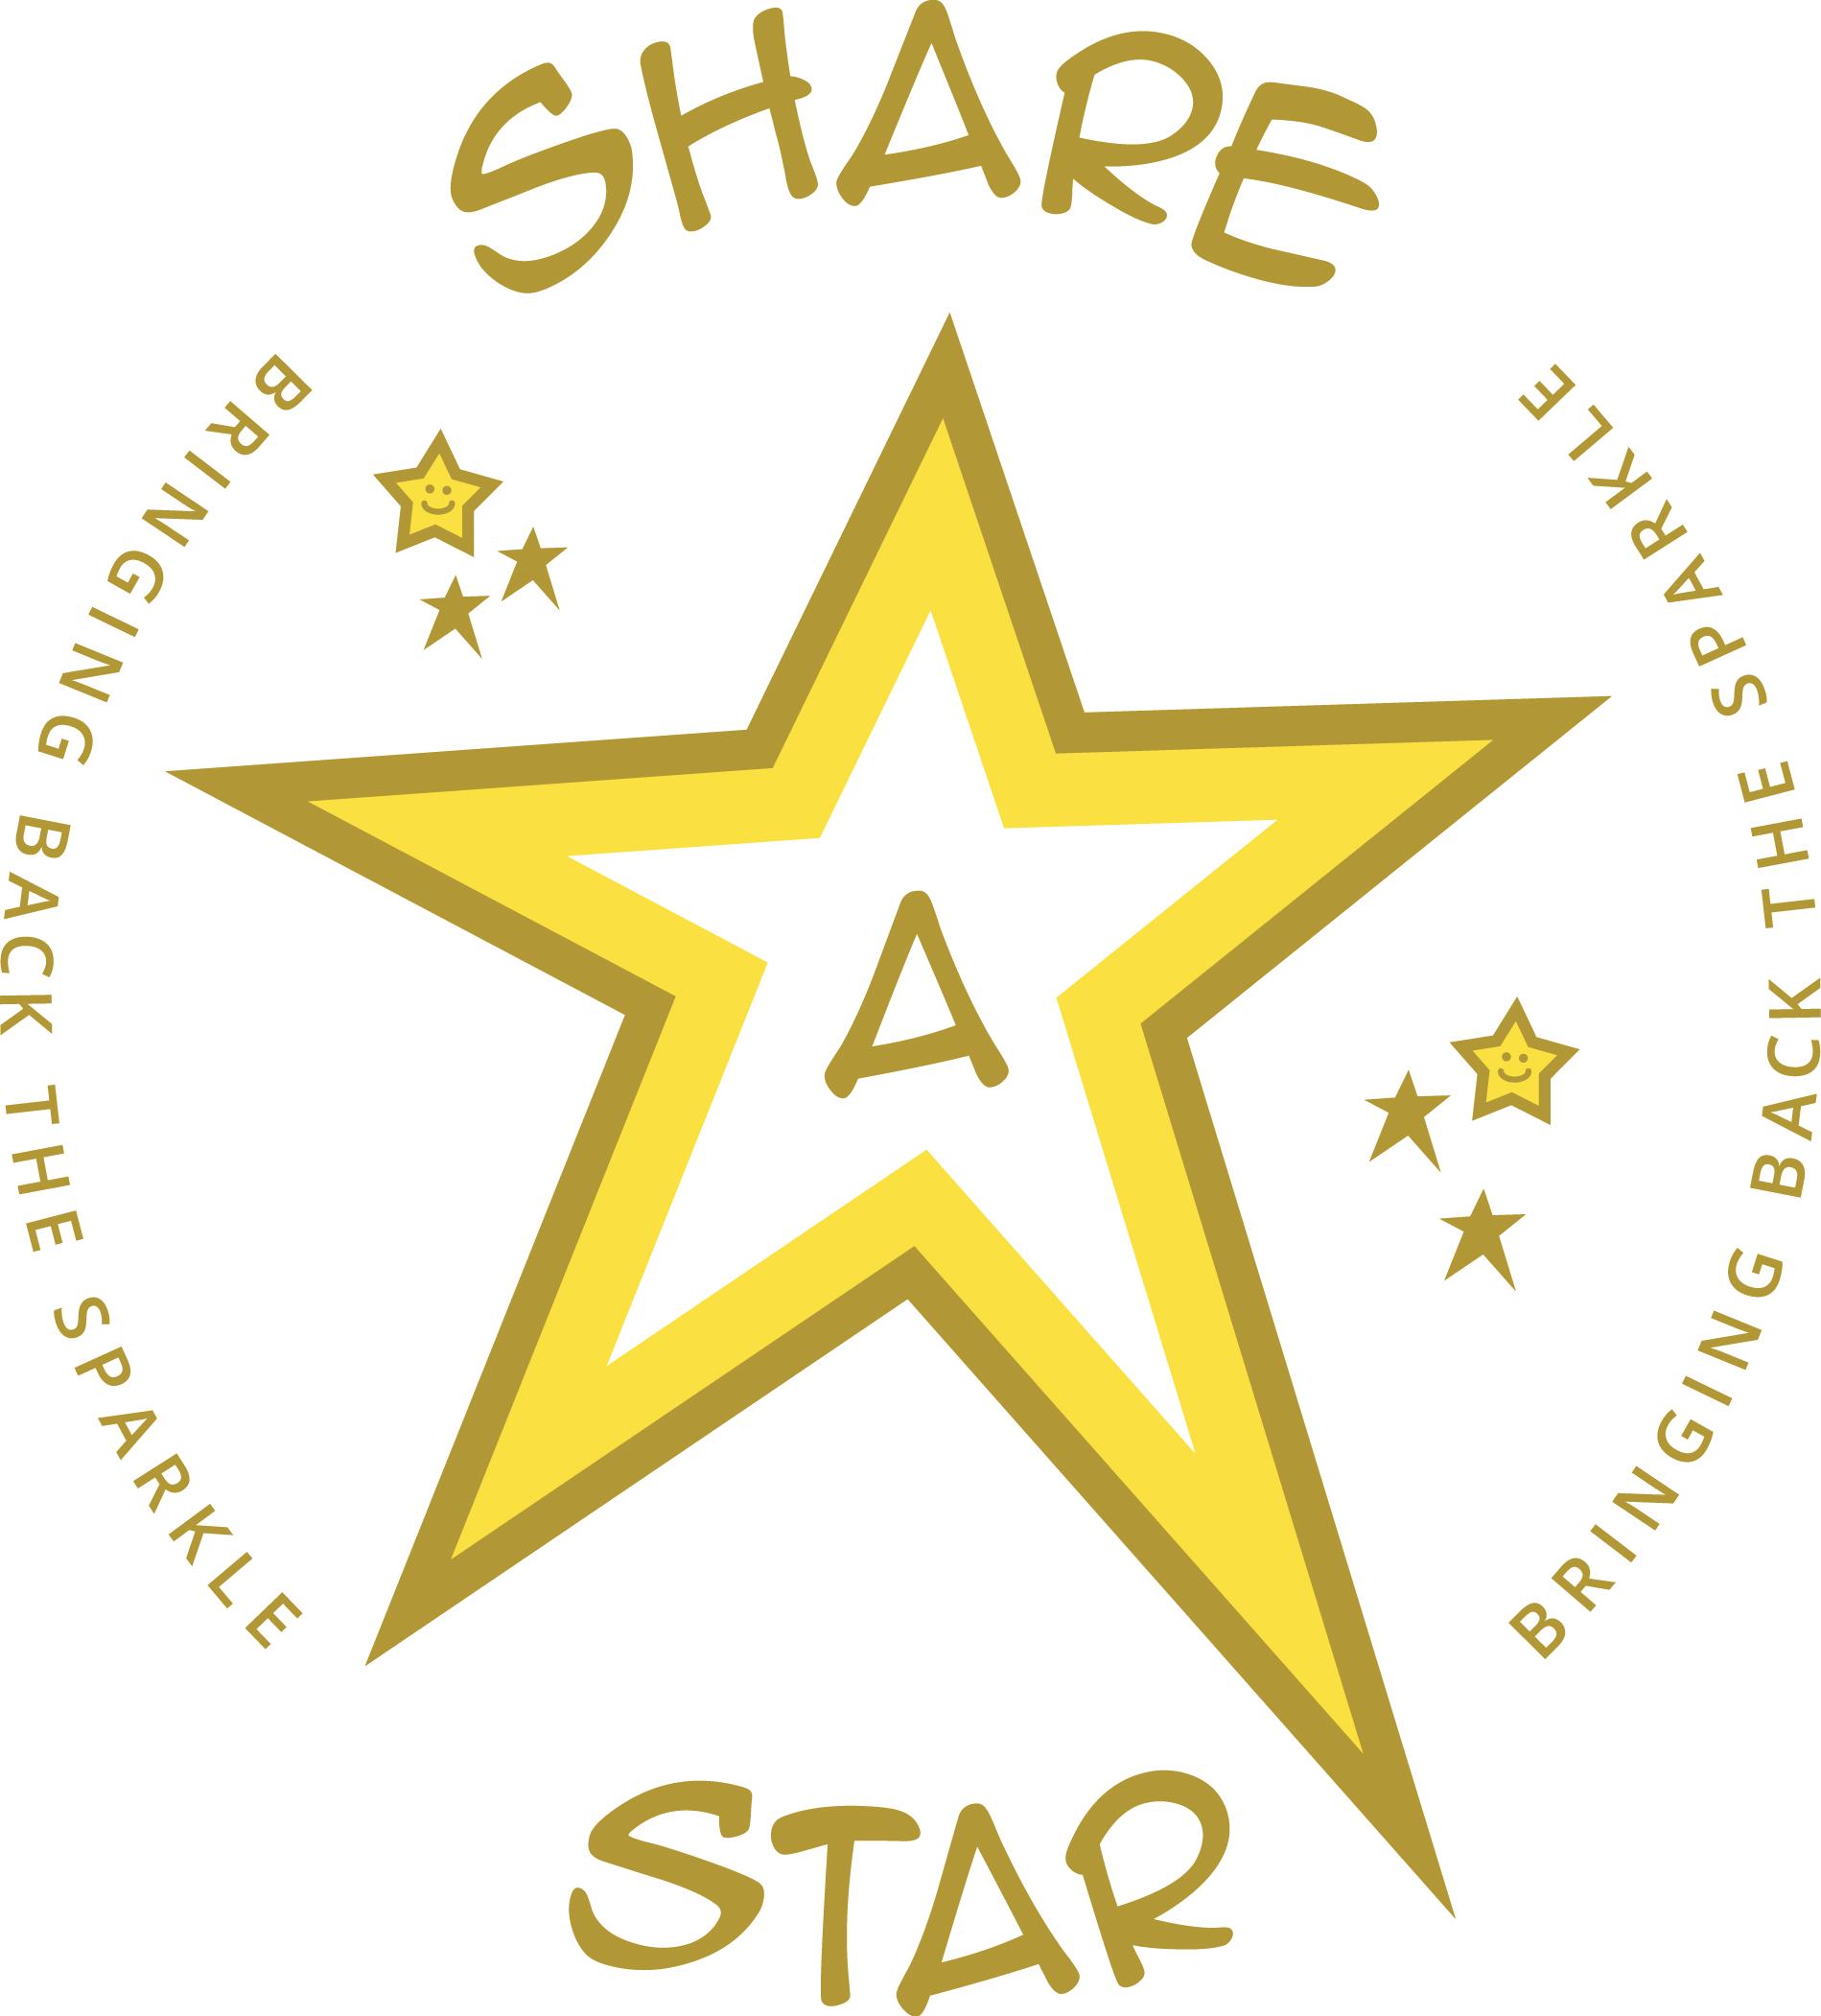 Share a Star.jpg